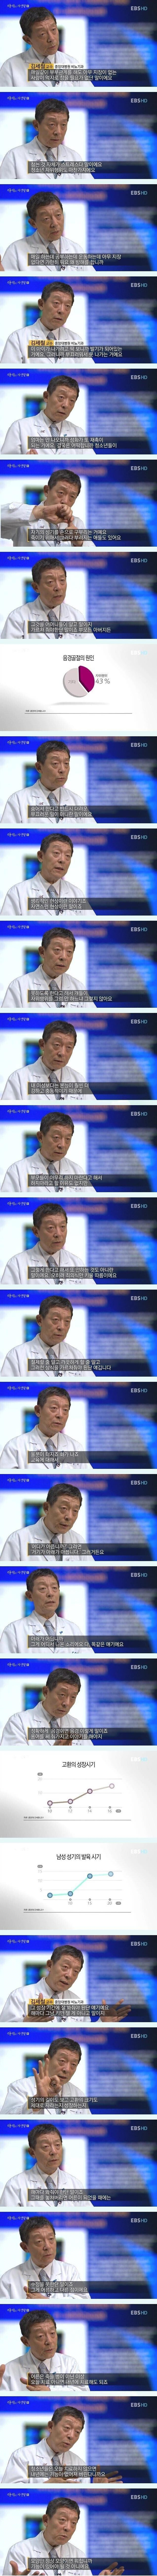 8805286ed08e2a3ce7518d0d24e77275_921910.jpeg 비뇨기과 의사가 말하는 자위